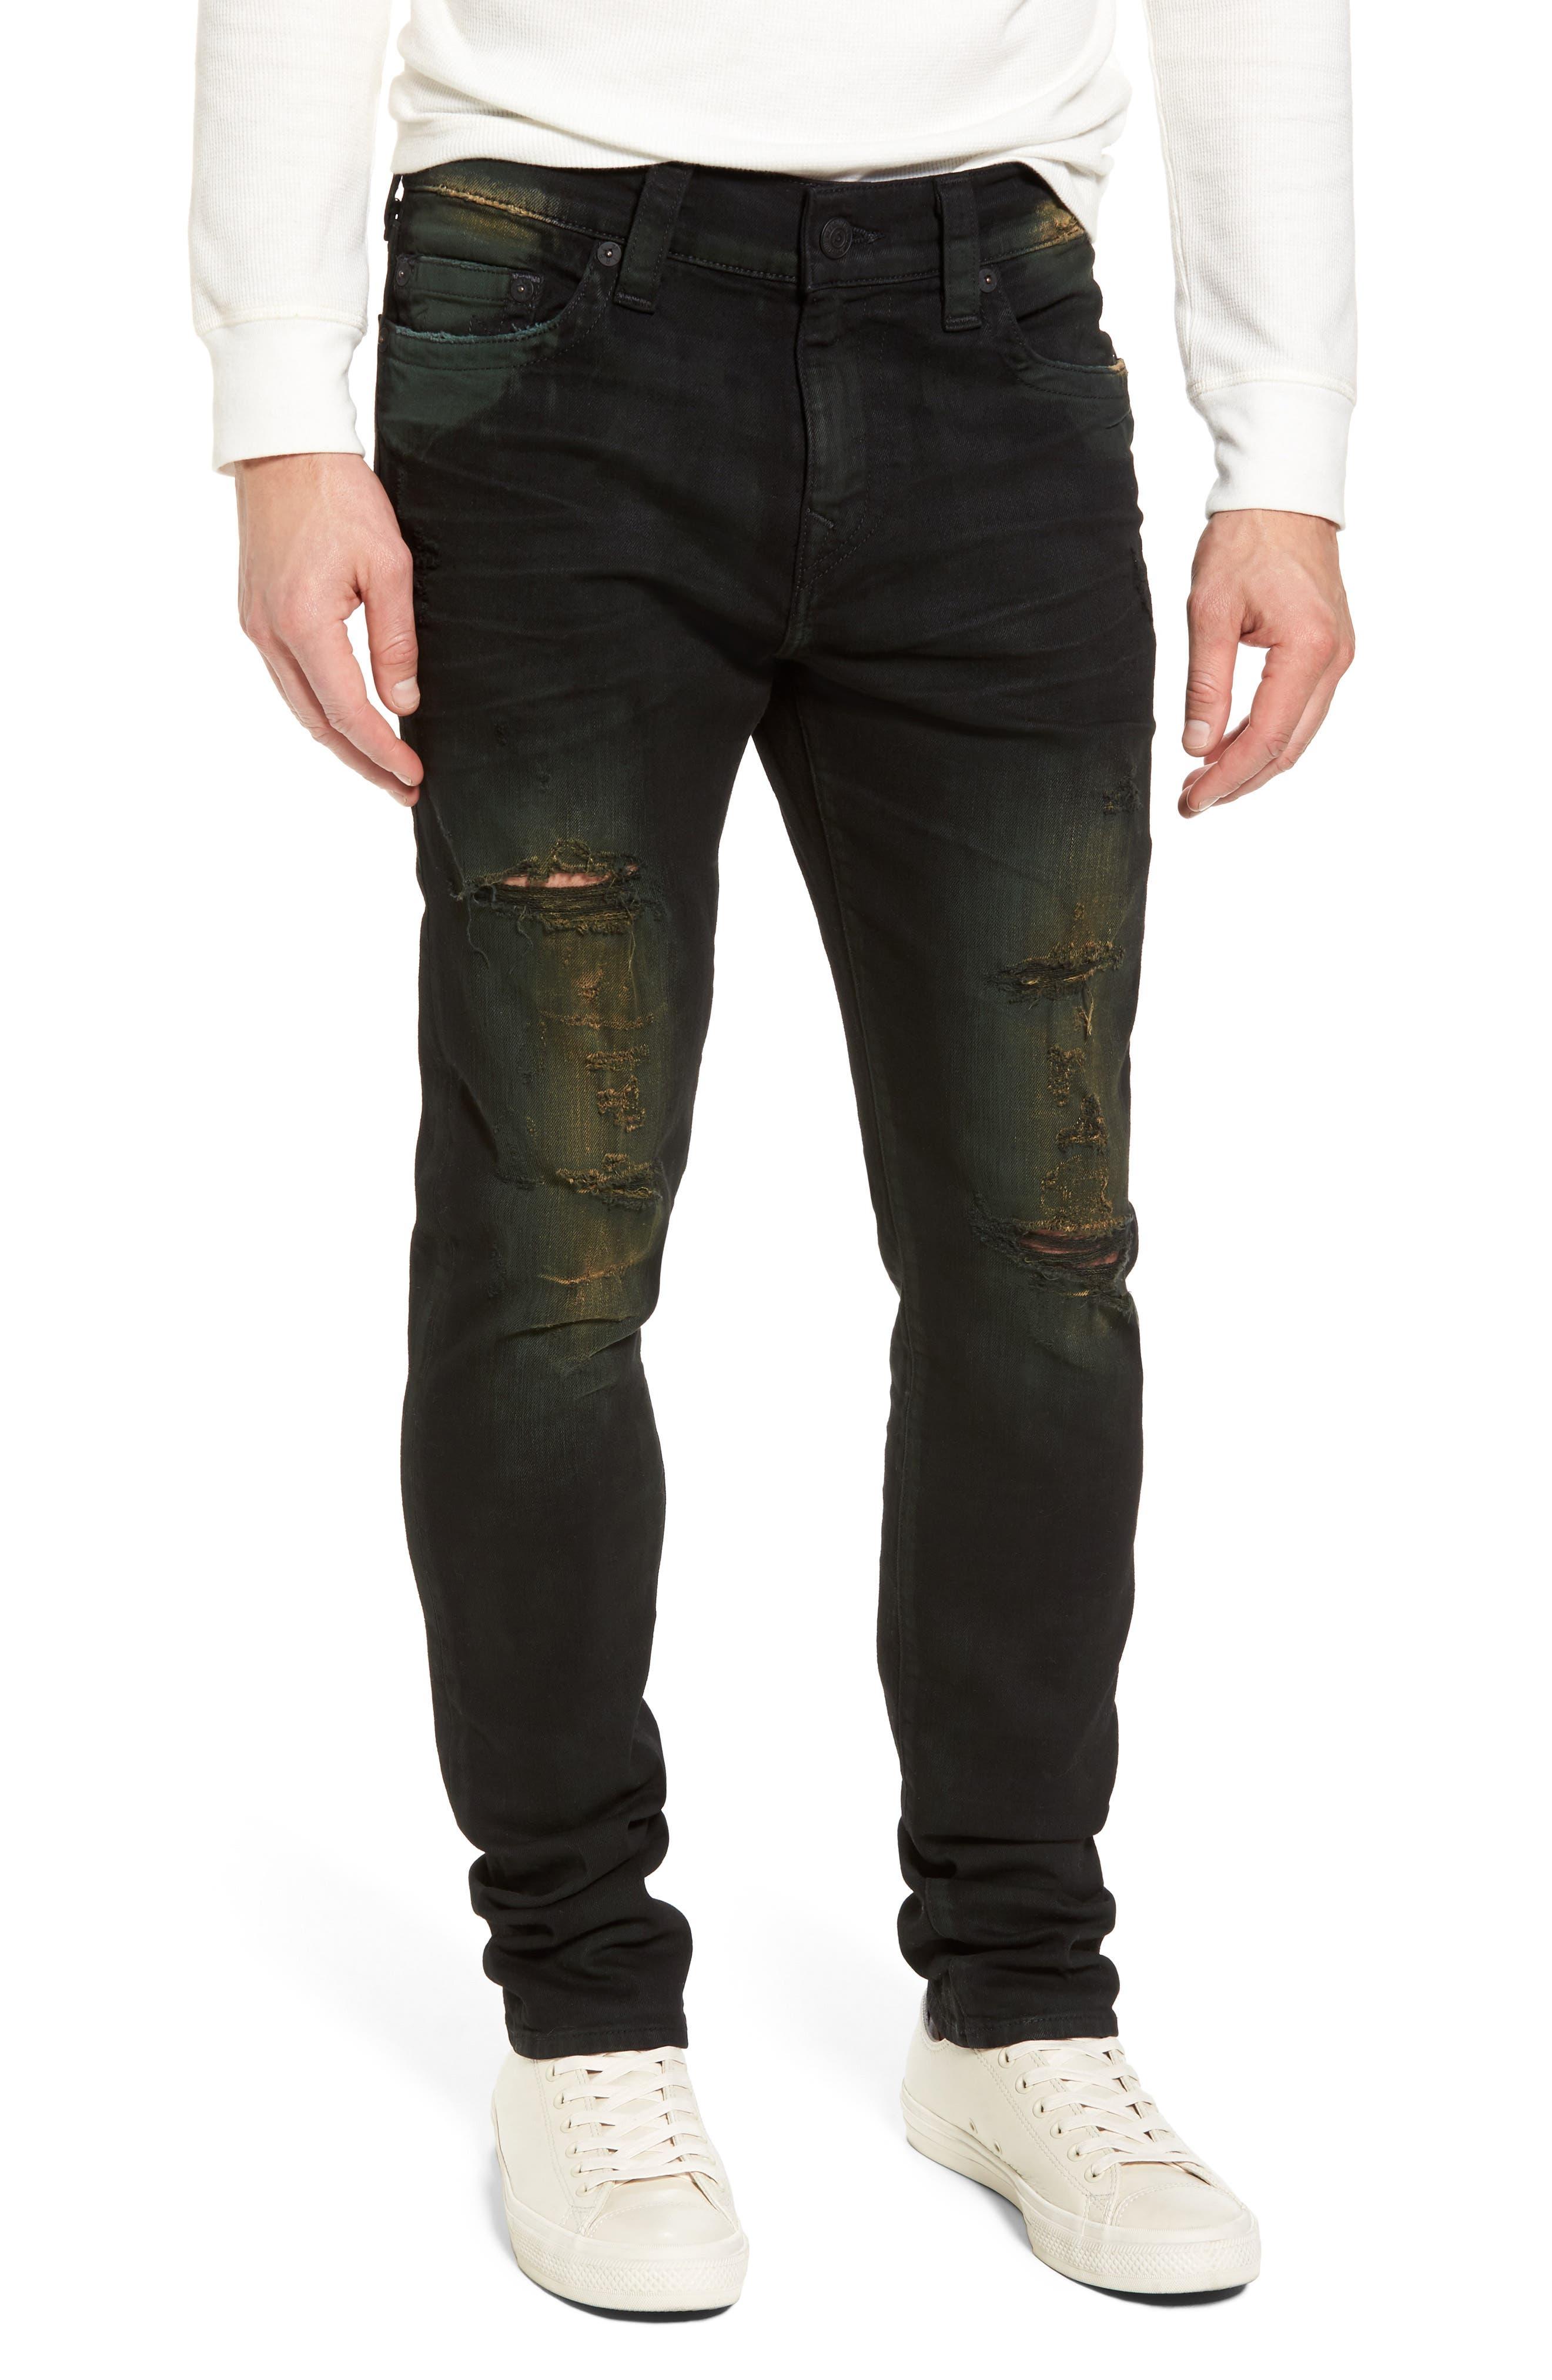 Main Image - True Religion Brand Jeans Rocco Skinny Fit Jeans (Green Blaze)